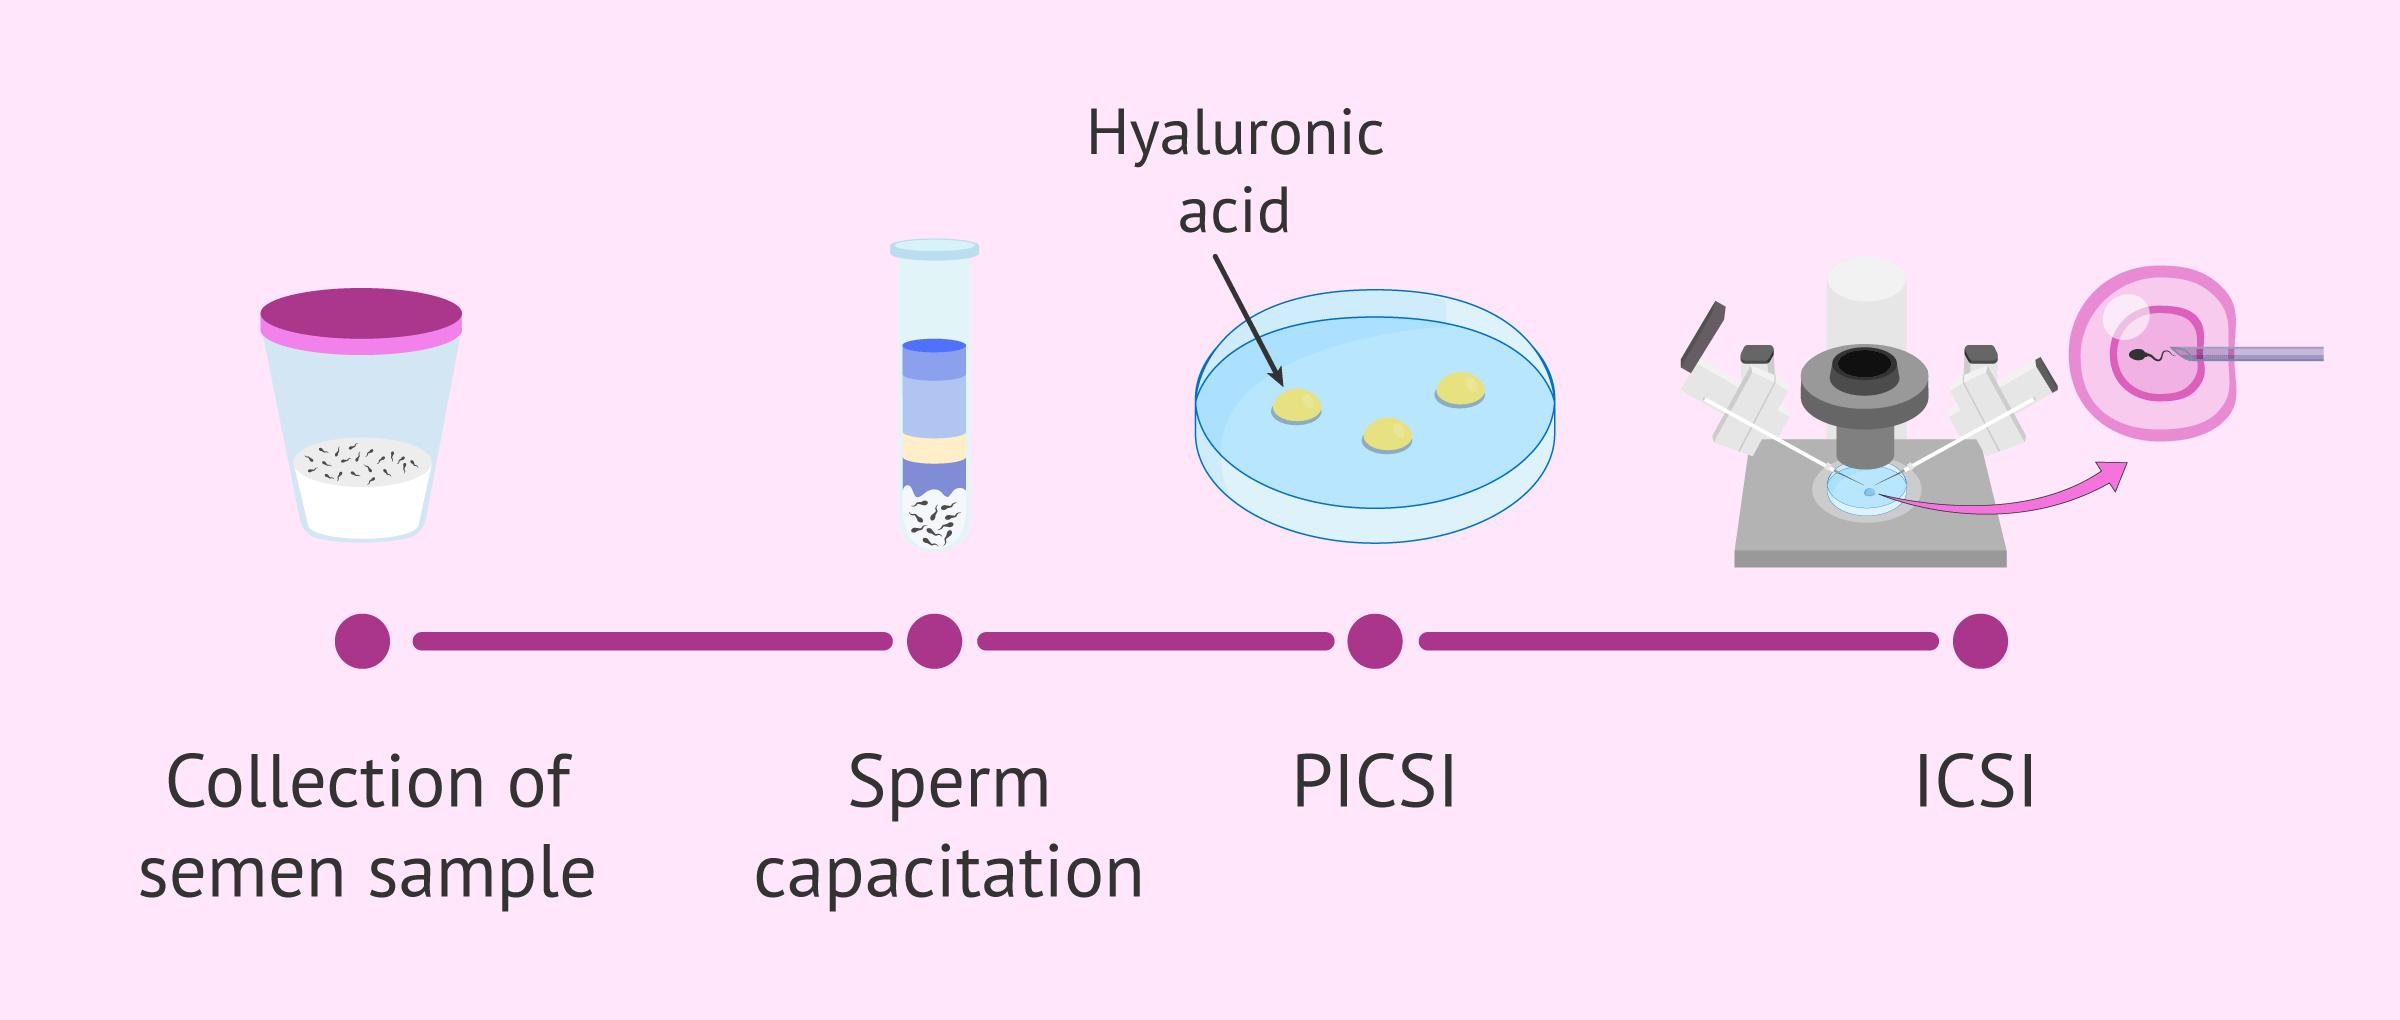 Procedure of PICSI